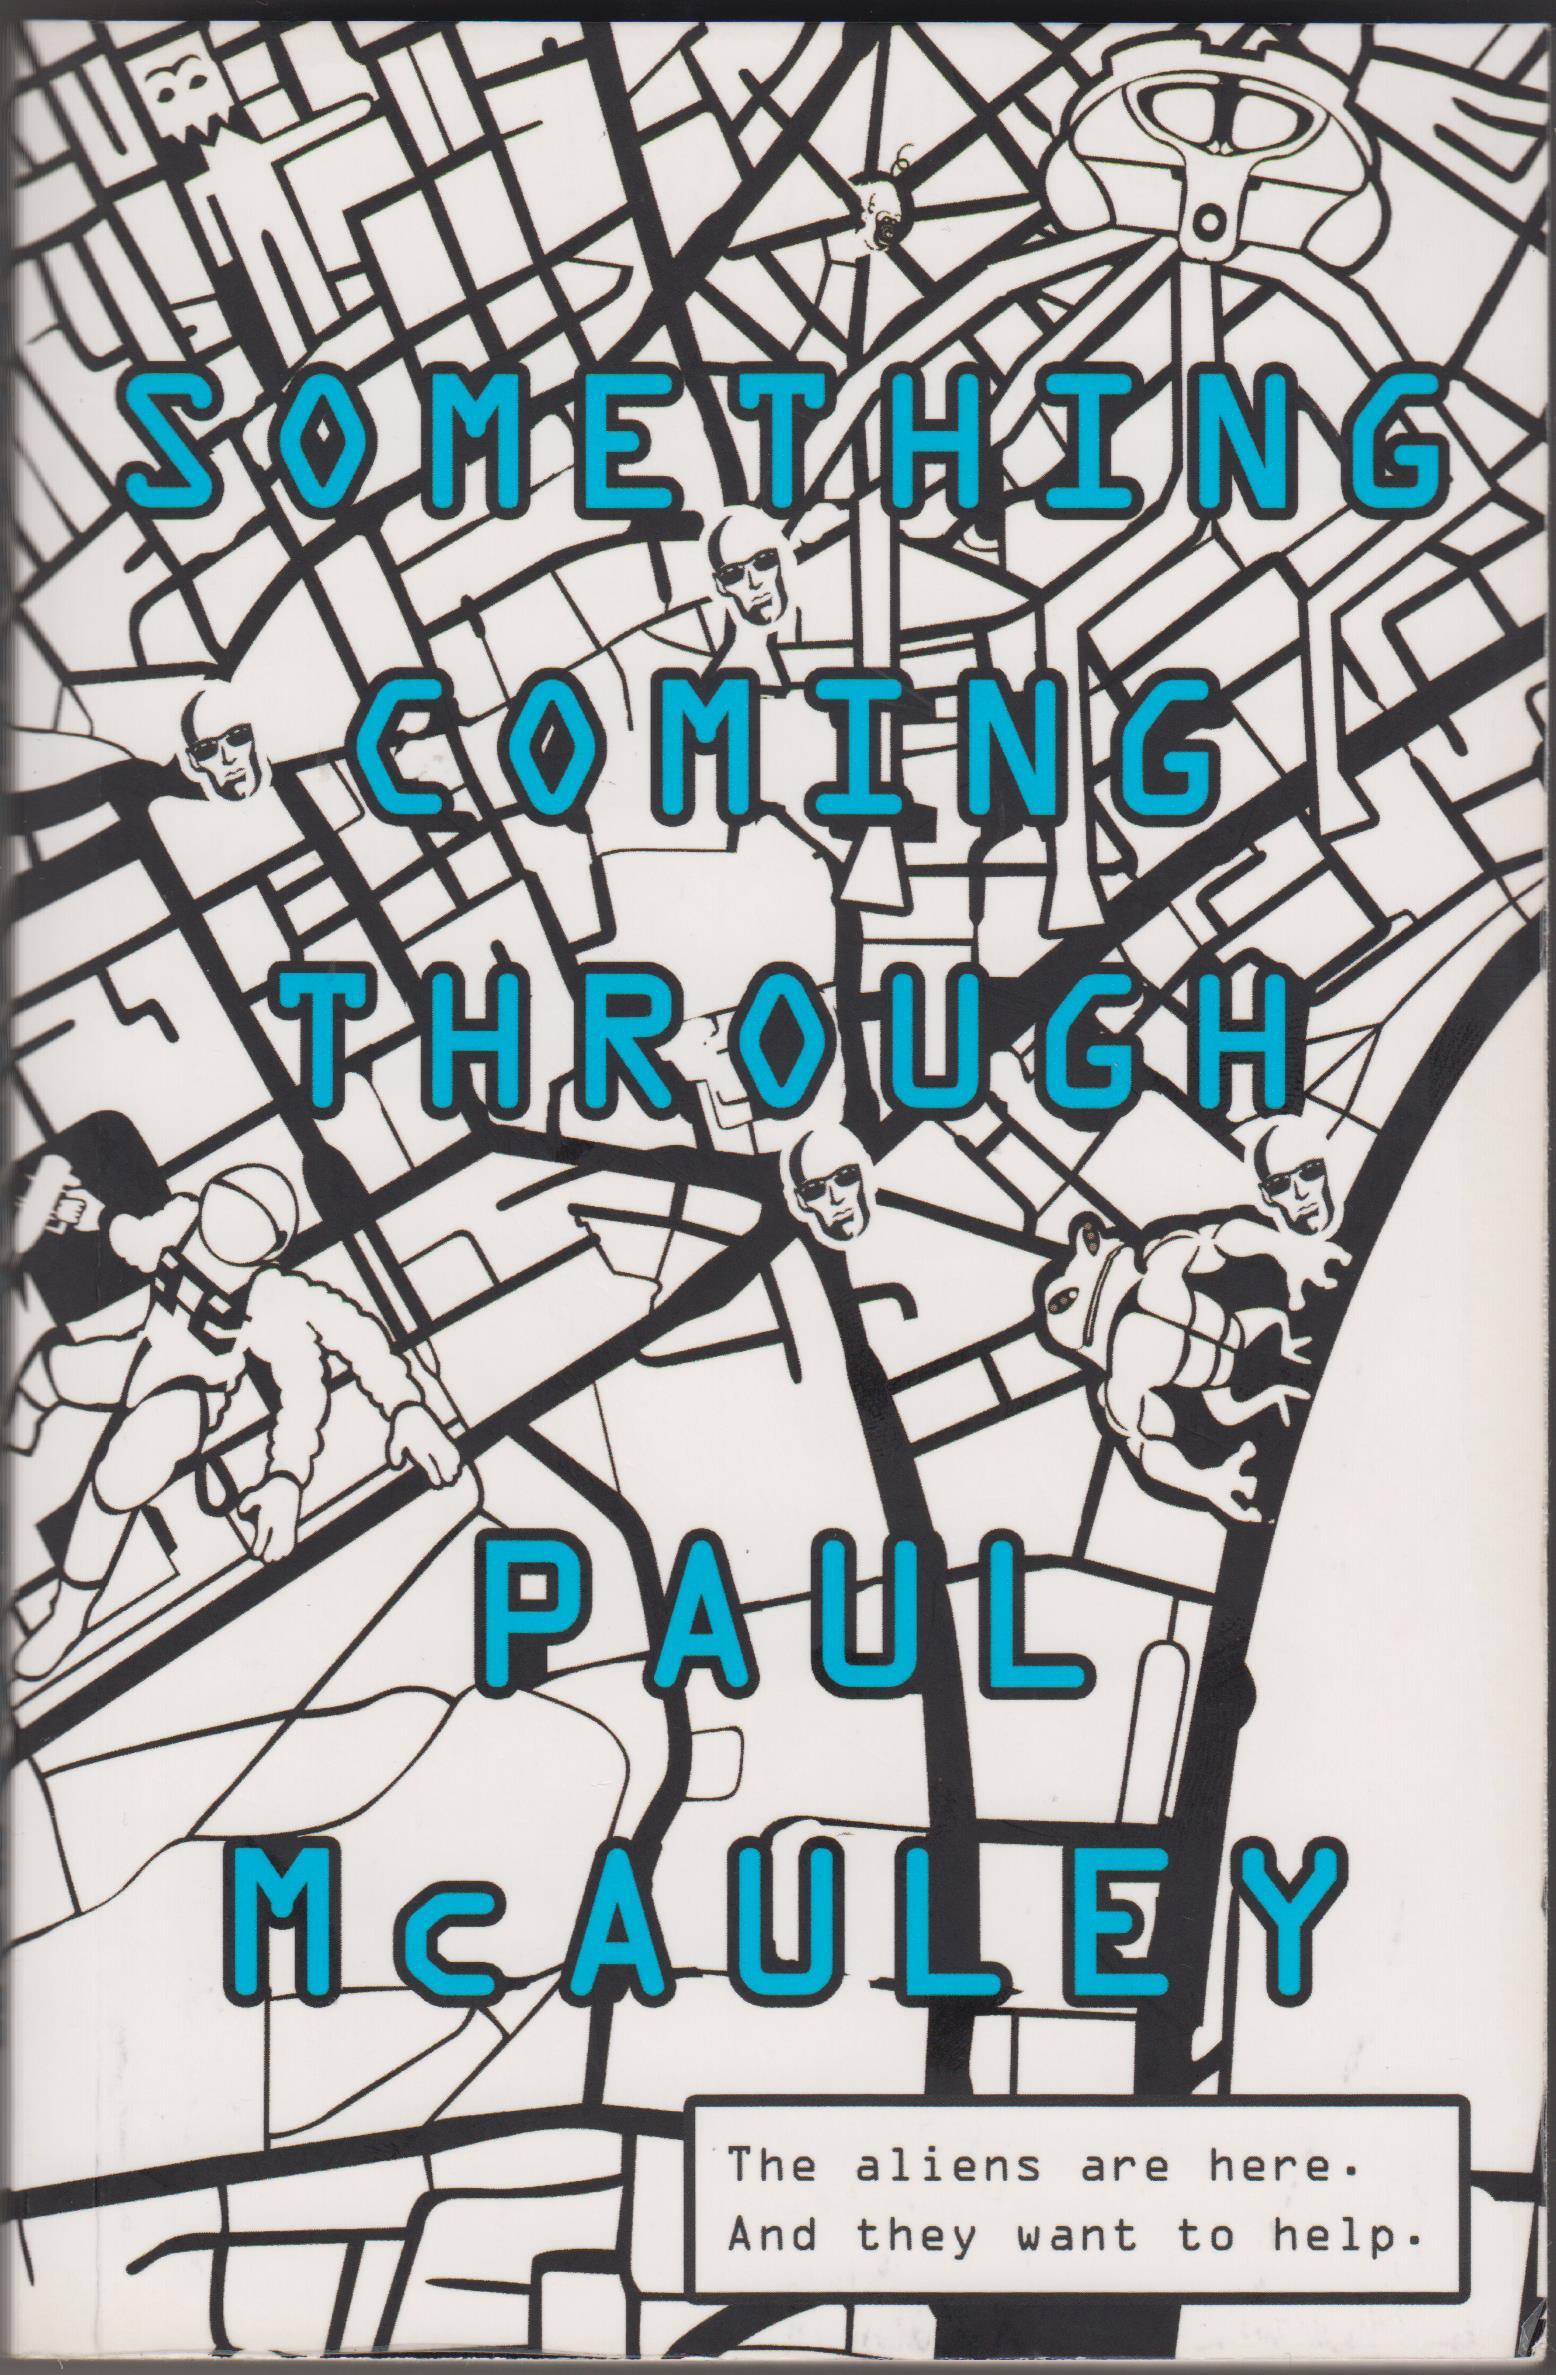 Somethinging Through Paul Mcauleysmall